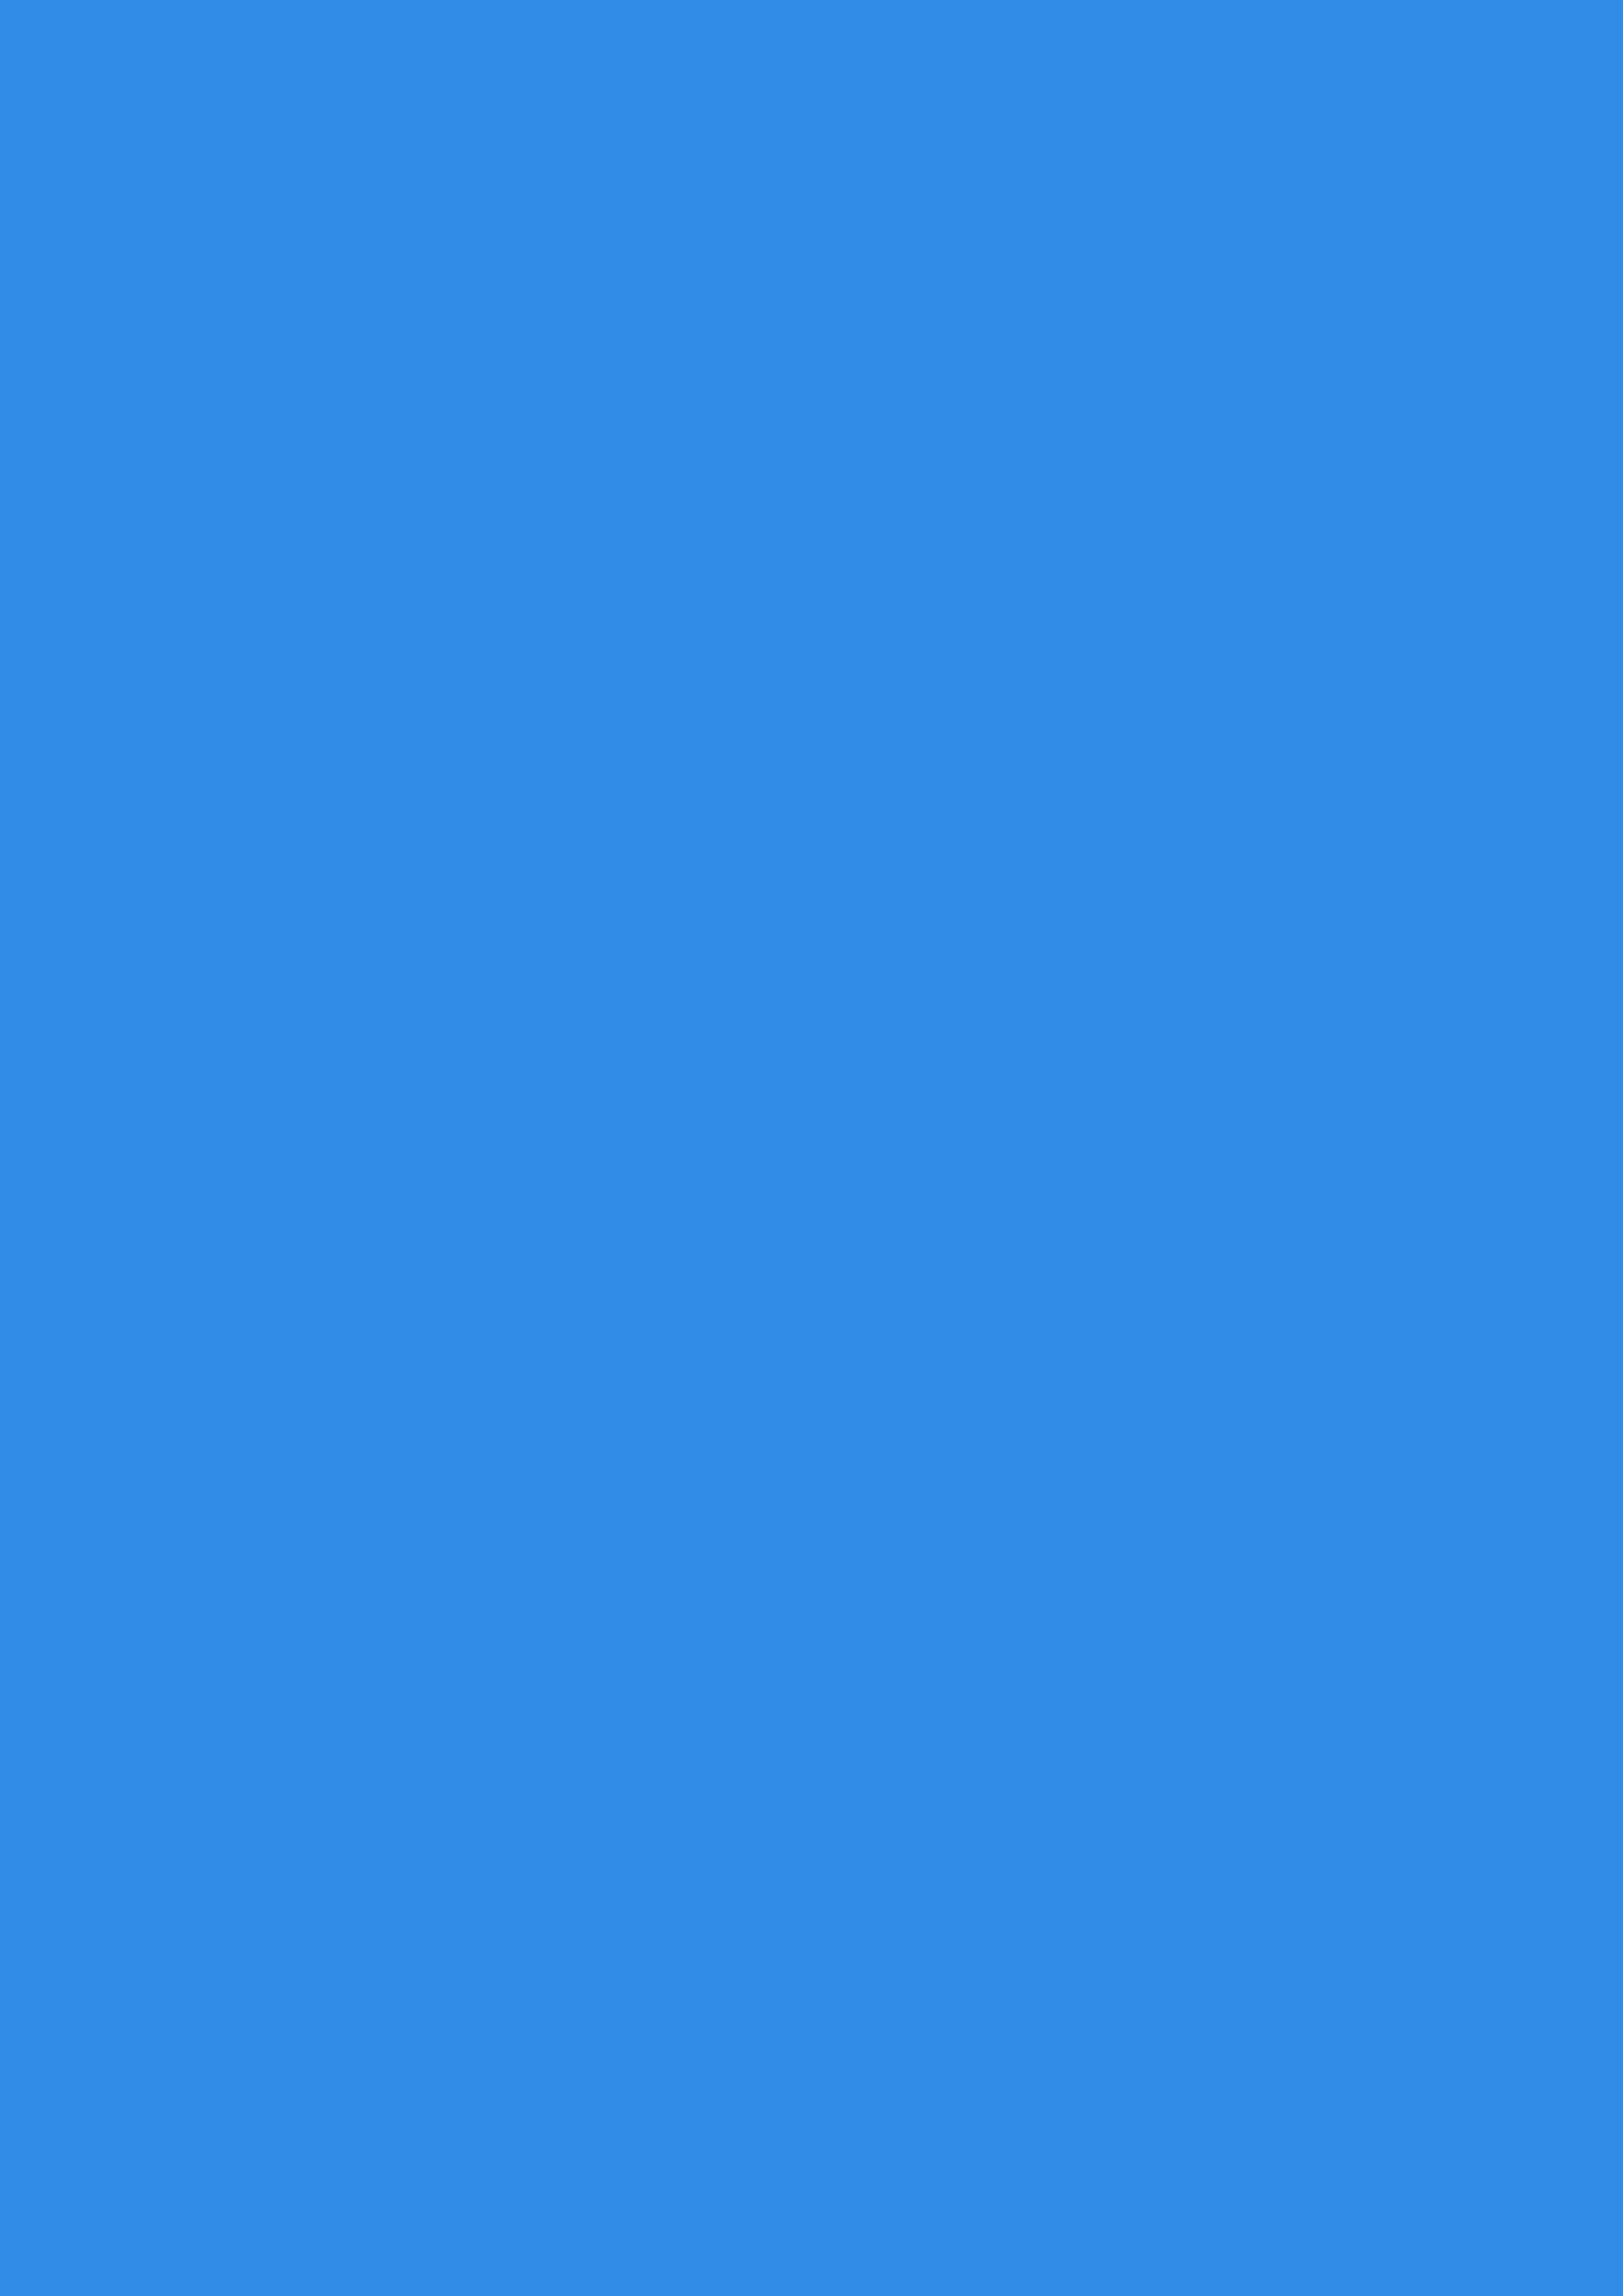 2480x3508 Bleu De France Solid Color Background